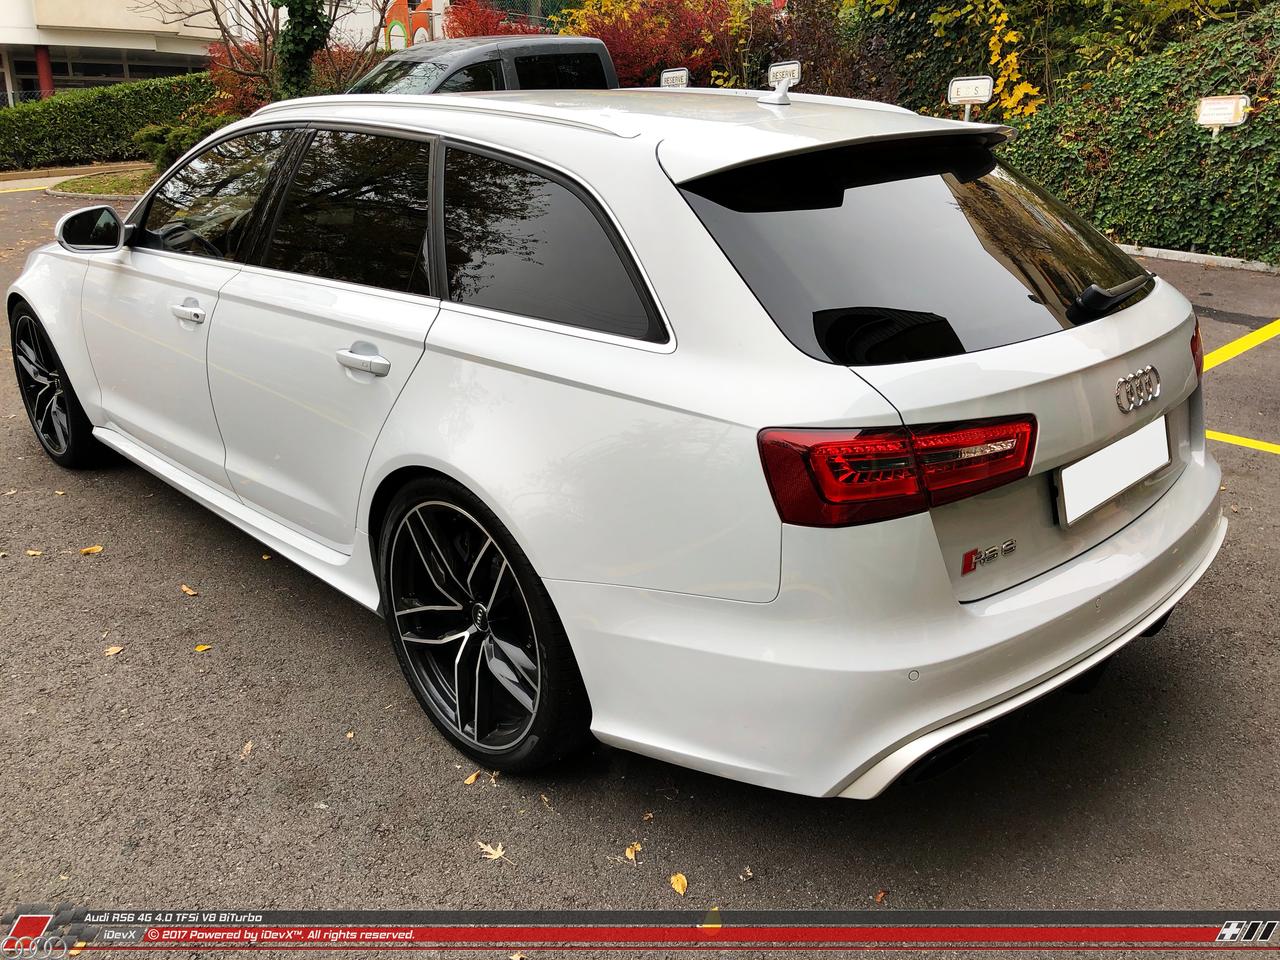 10_11.2018_Audi-RS6_iDevX_025.png